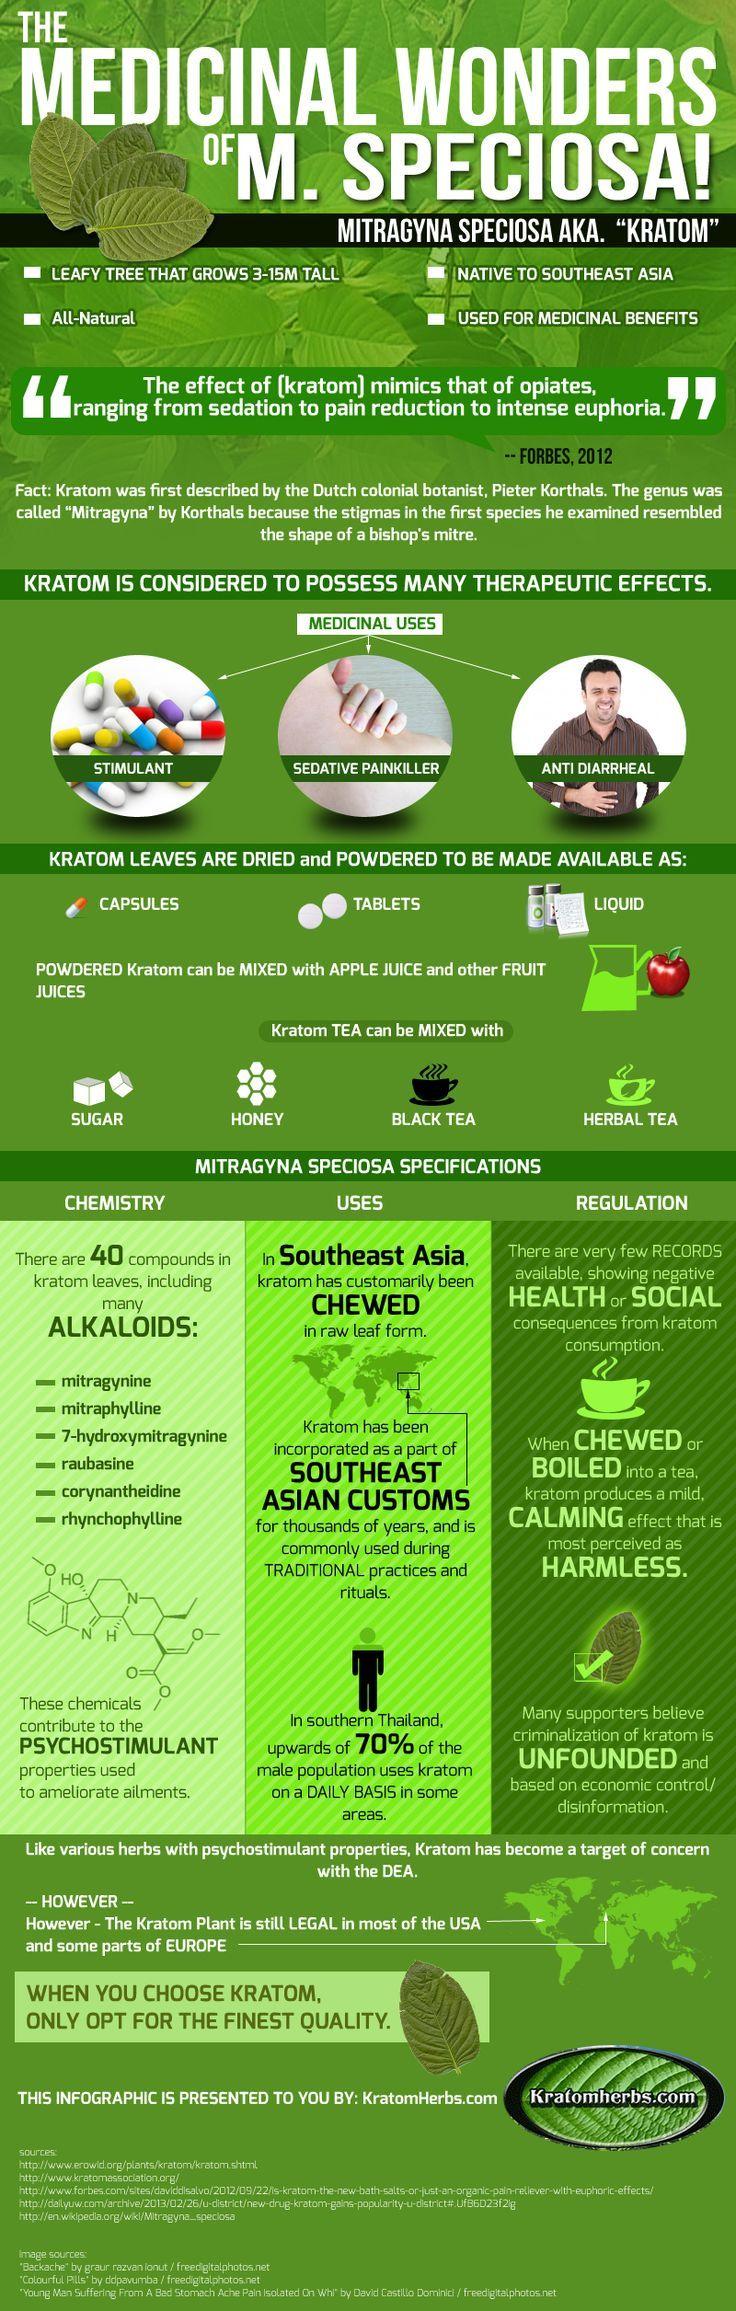 http://www.kratomherbs.com/what_is_kratom_buy_kratom_online_s/1837.htm The Medicinal Wonders of Mitragyna Speciosa Kratom [Infographic]